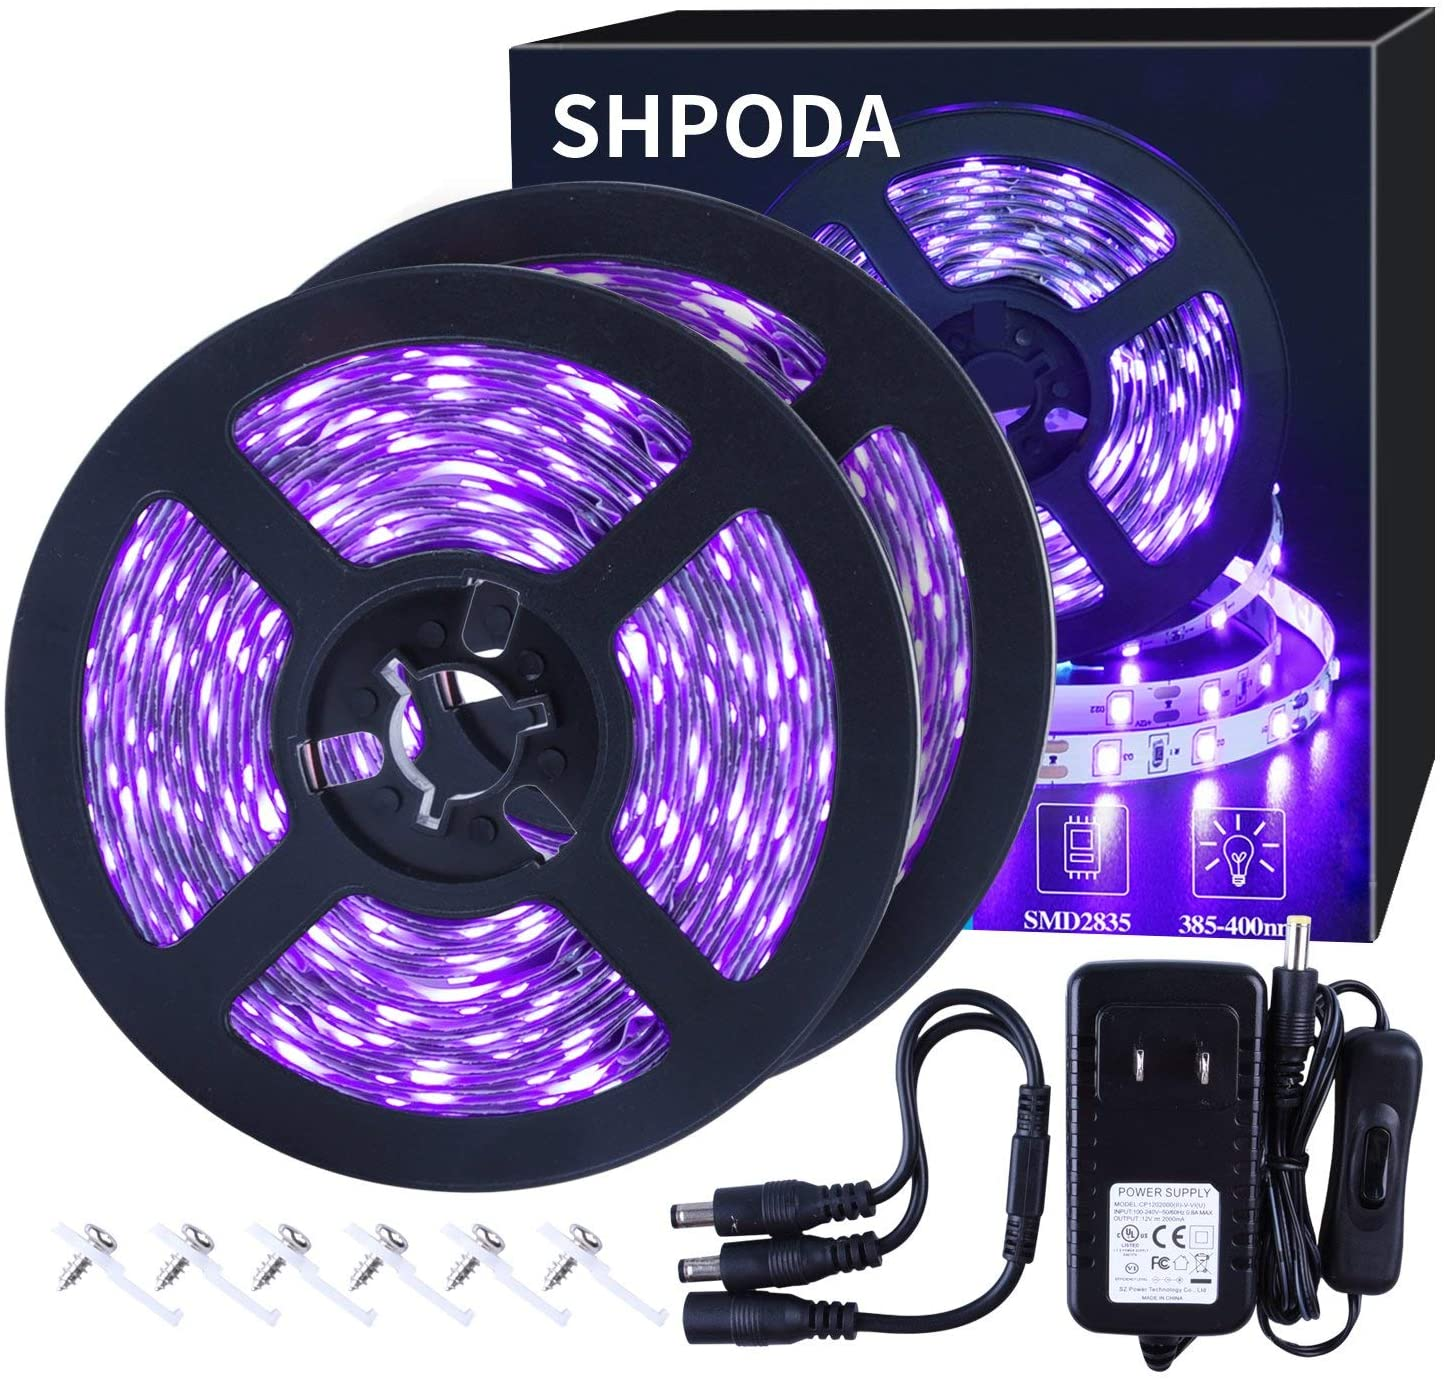 SHPODA 33ft LED black light strip kit review